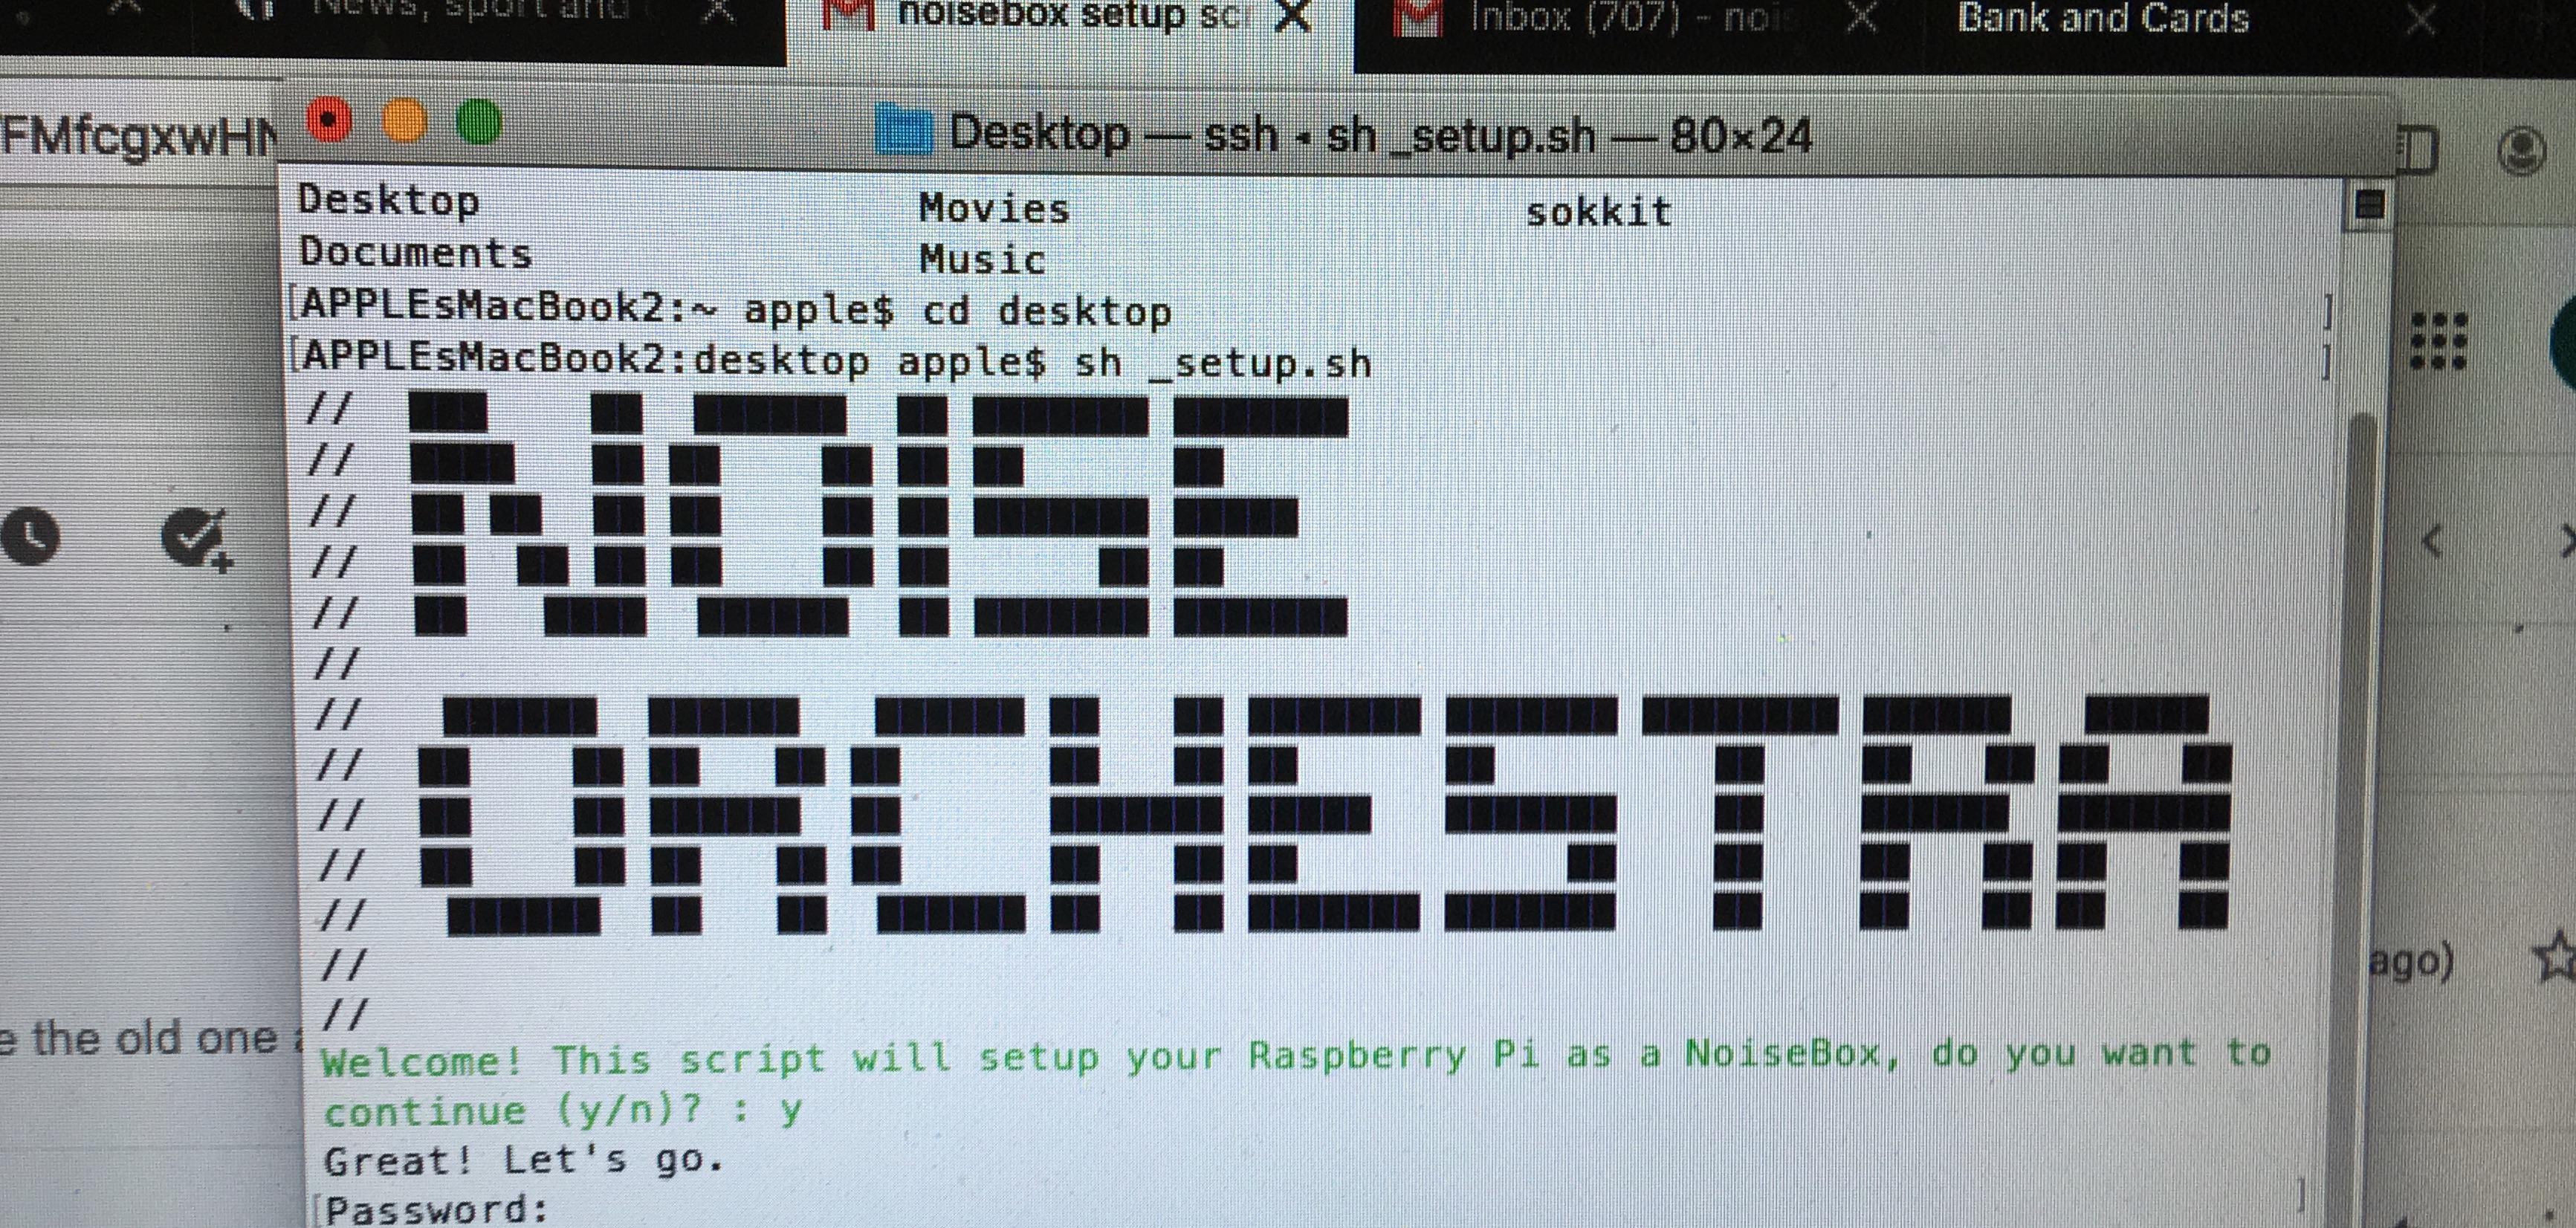 Noise_ASCII